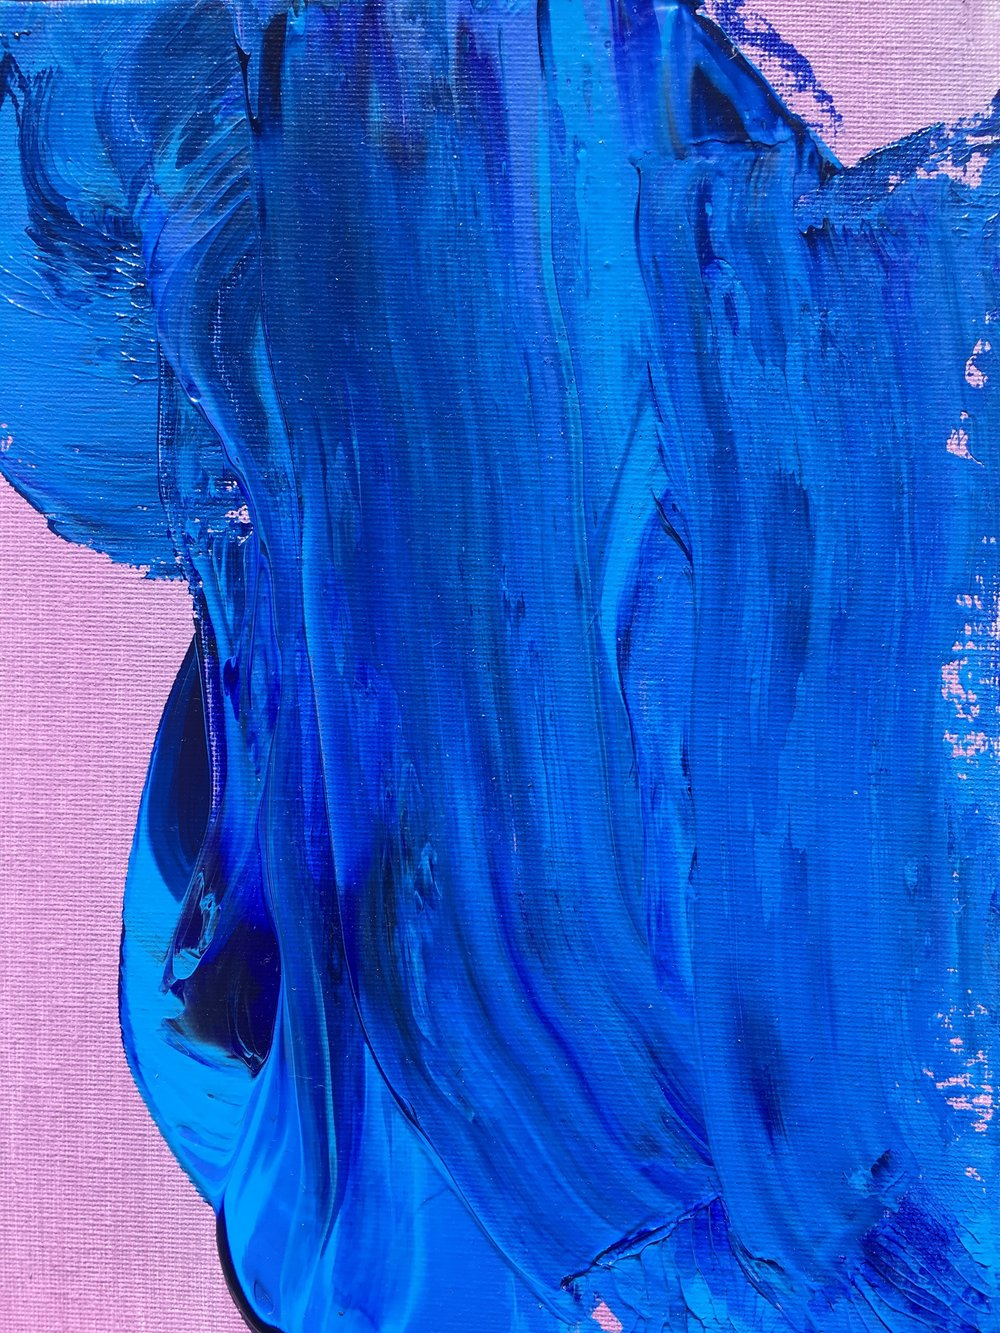 purple haze, acrylic paint, 8x10 in. panel, (2018)